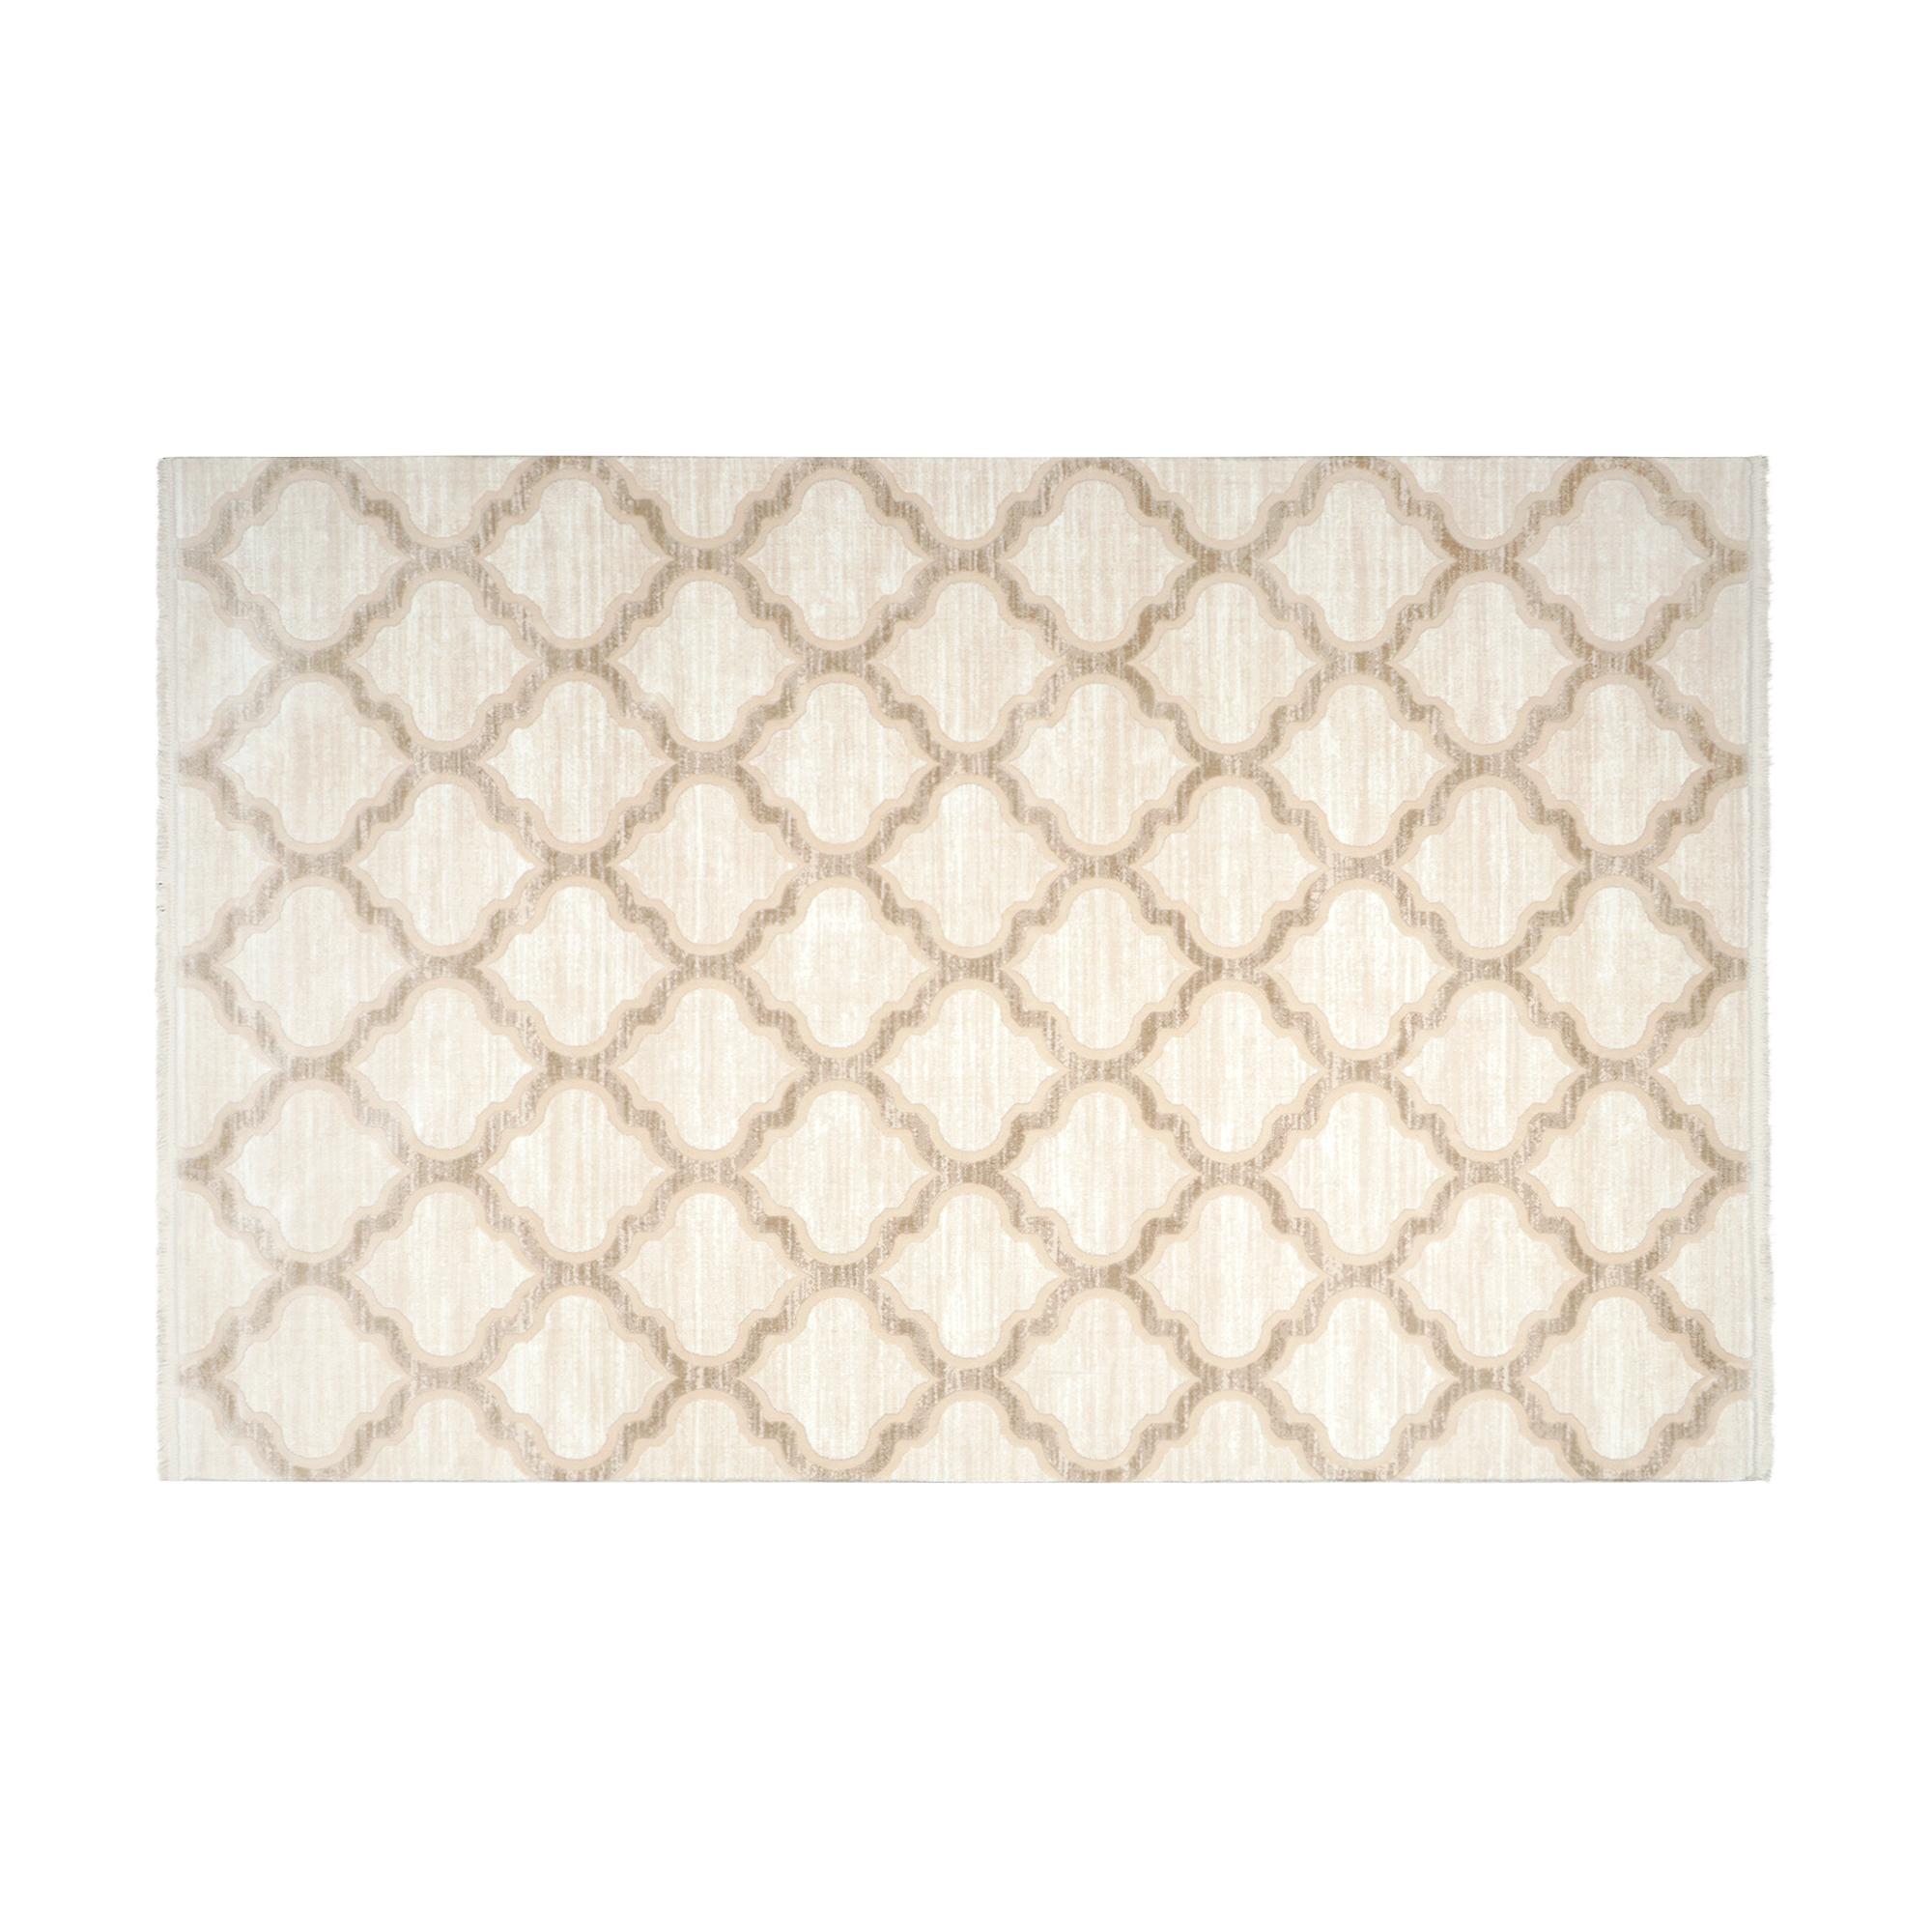 Ковер Ковровые галереи 1.60х2.30 emp 8542b beige/beige